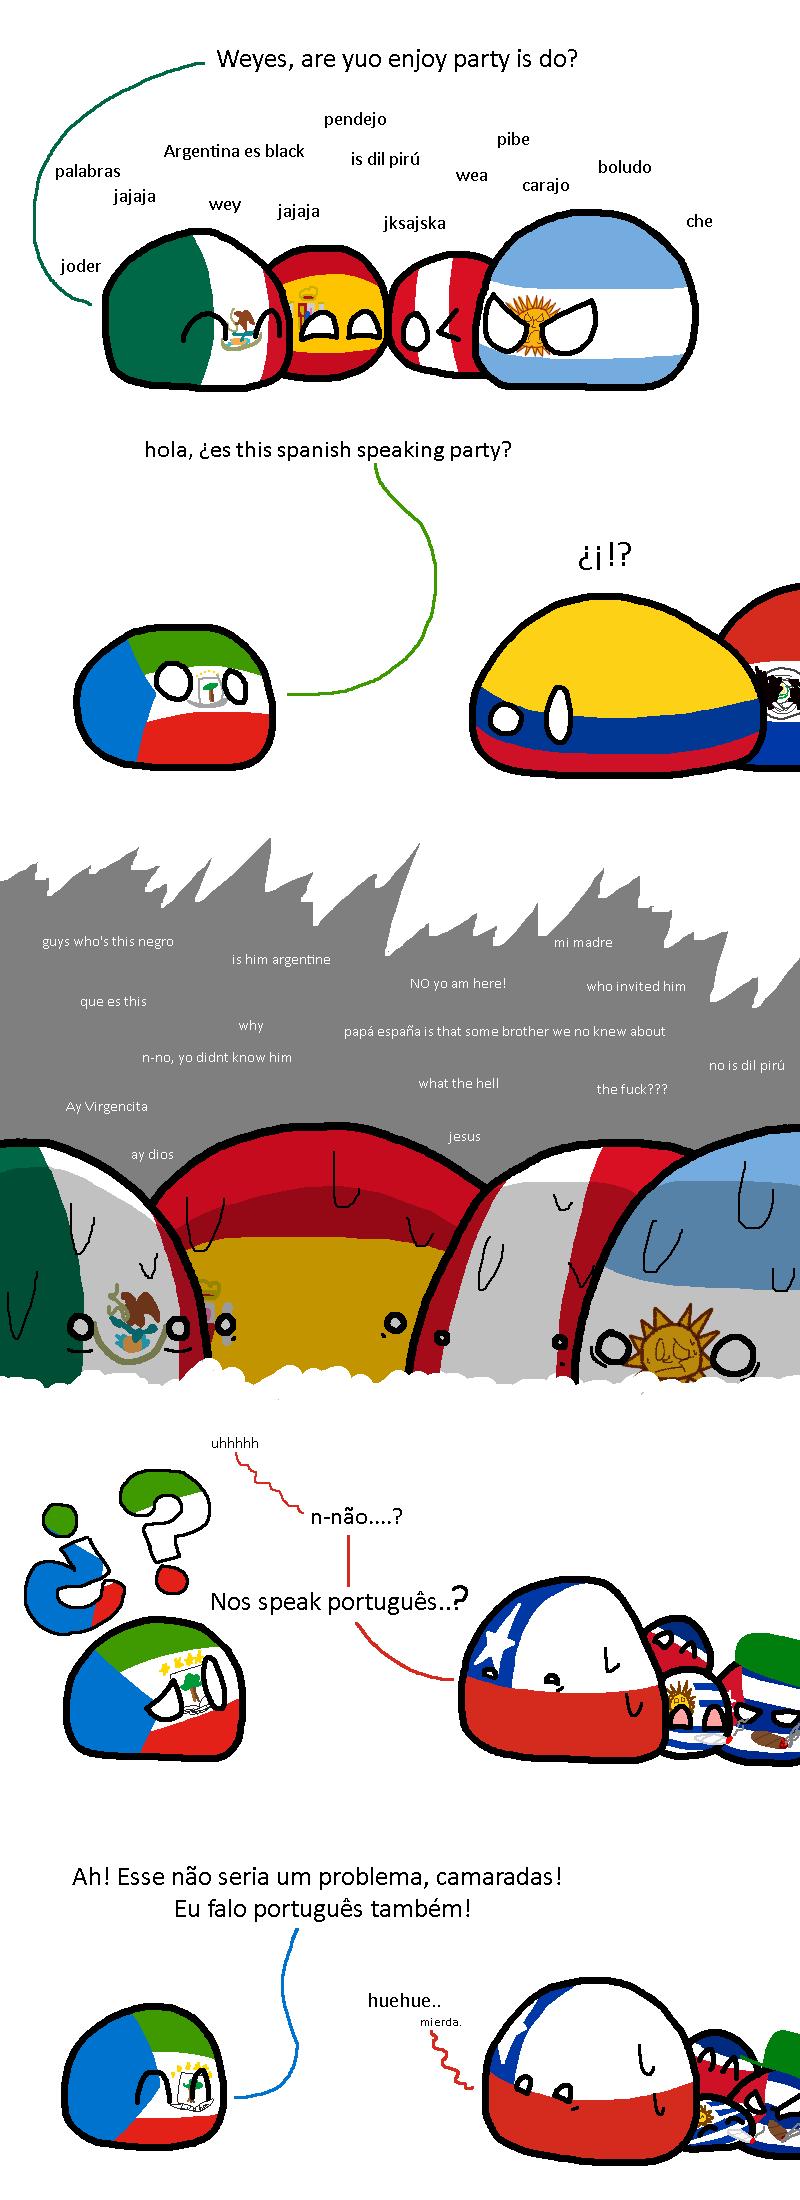 Polandball Countryball Memes The Best Polandball And Countryball Memes Cartoons And Comics Updated Daily Memes Country Memes Funny Logic